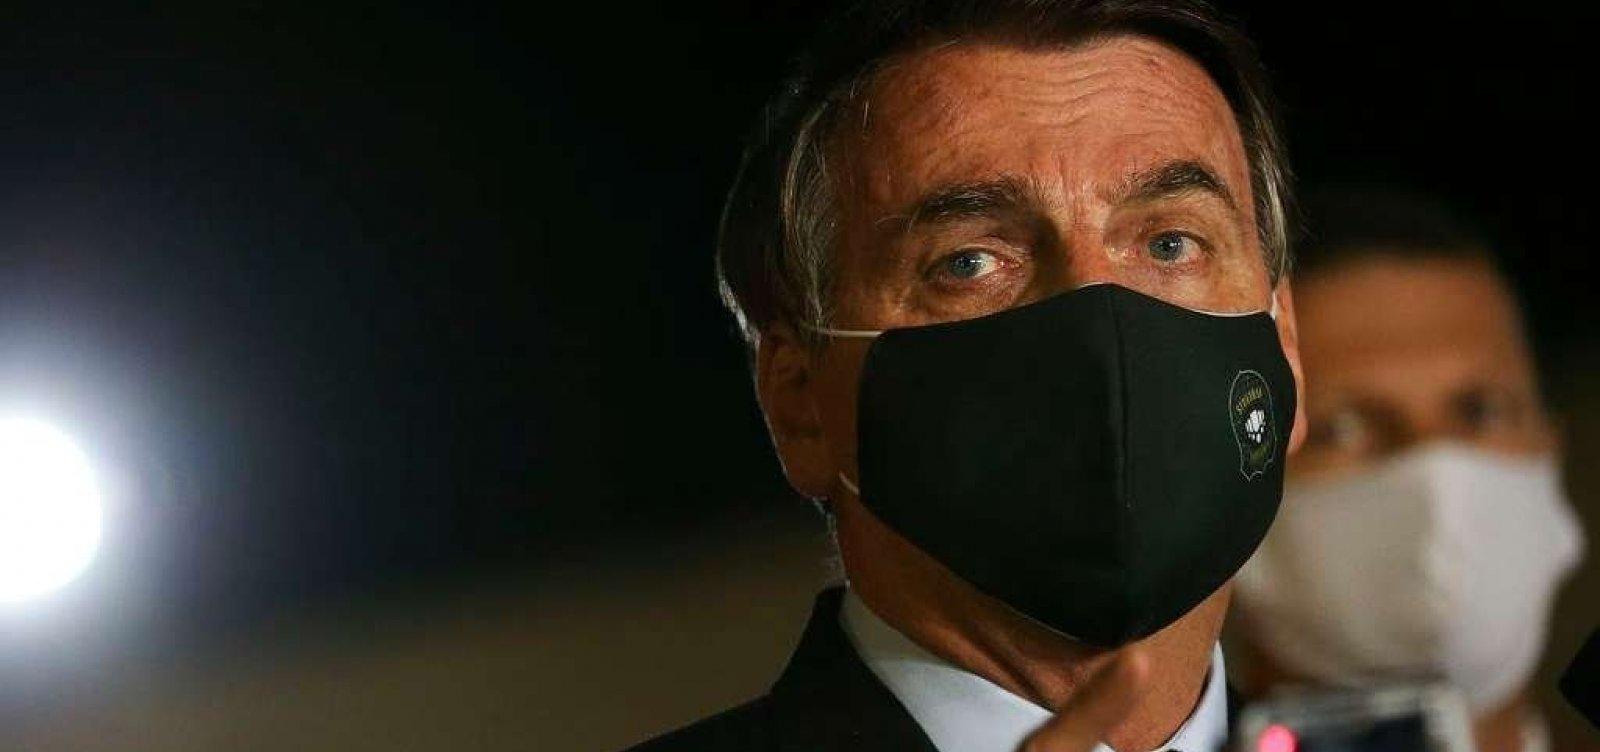 [Presidente Jair Bolsonaro é confirmado com coronavírus]